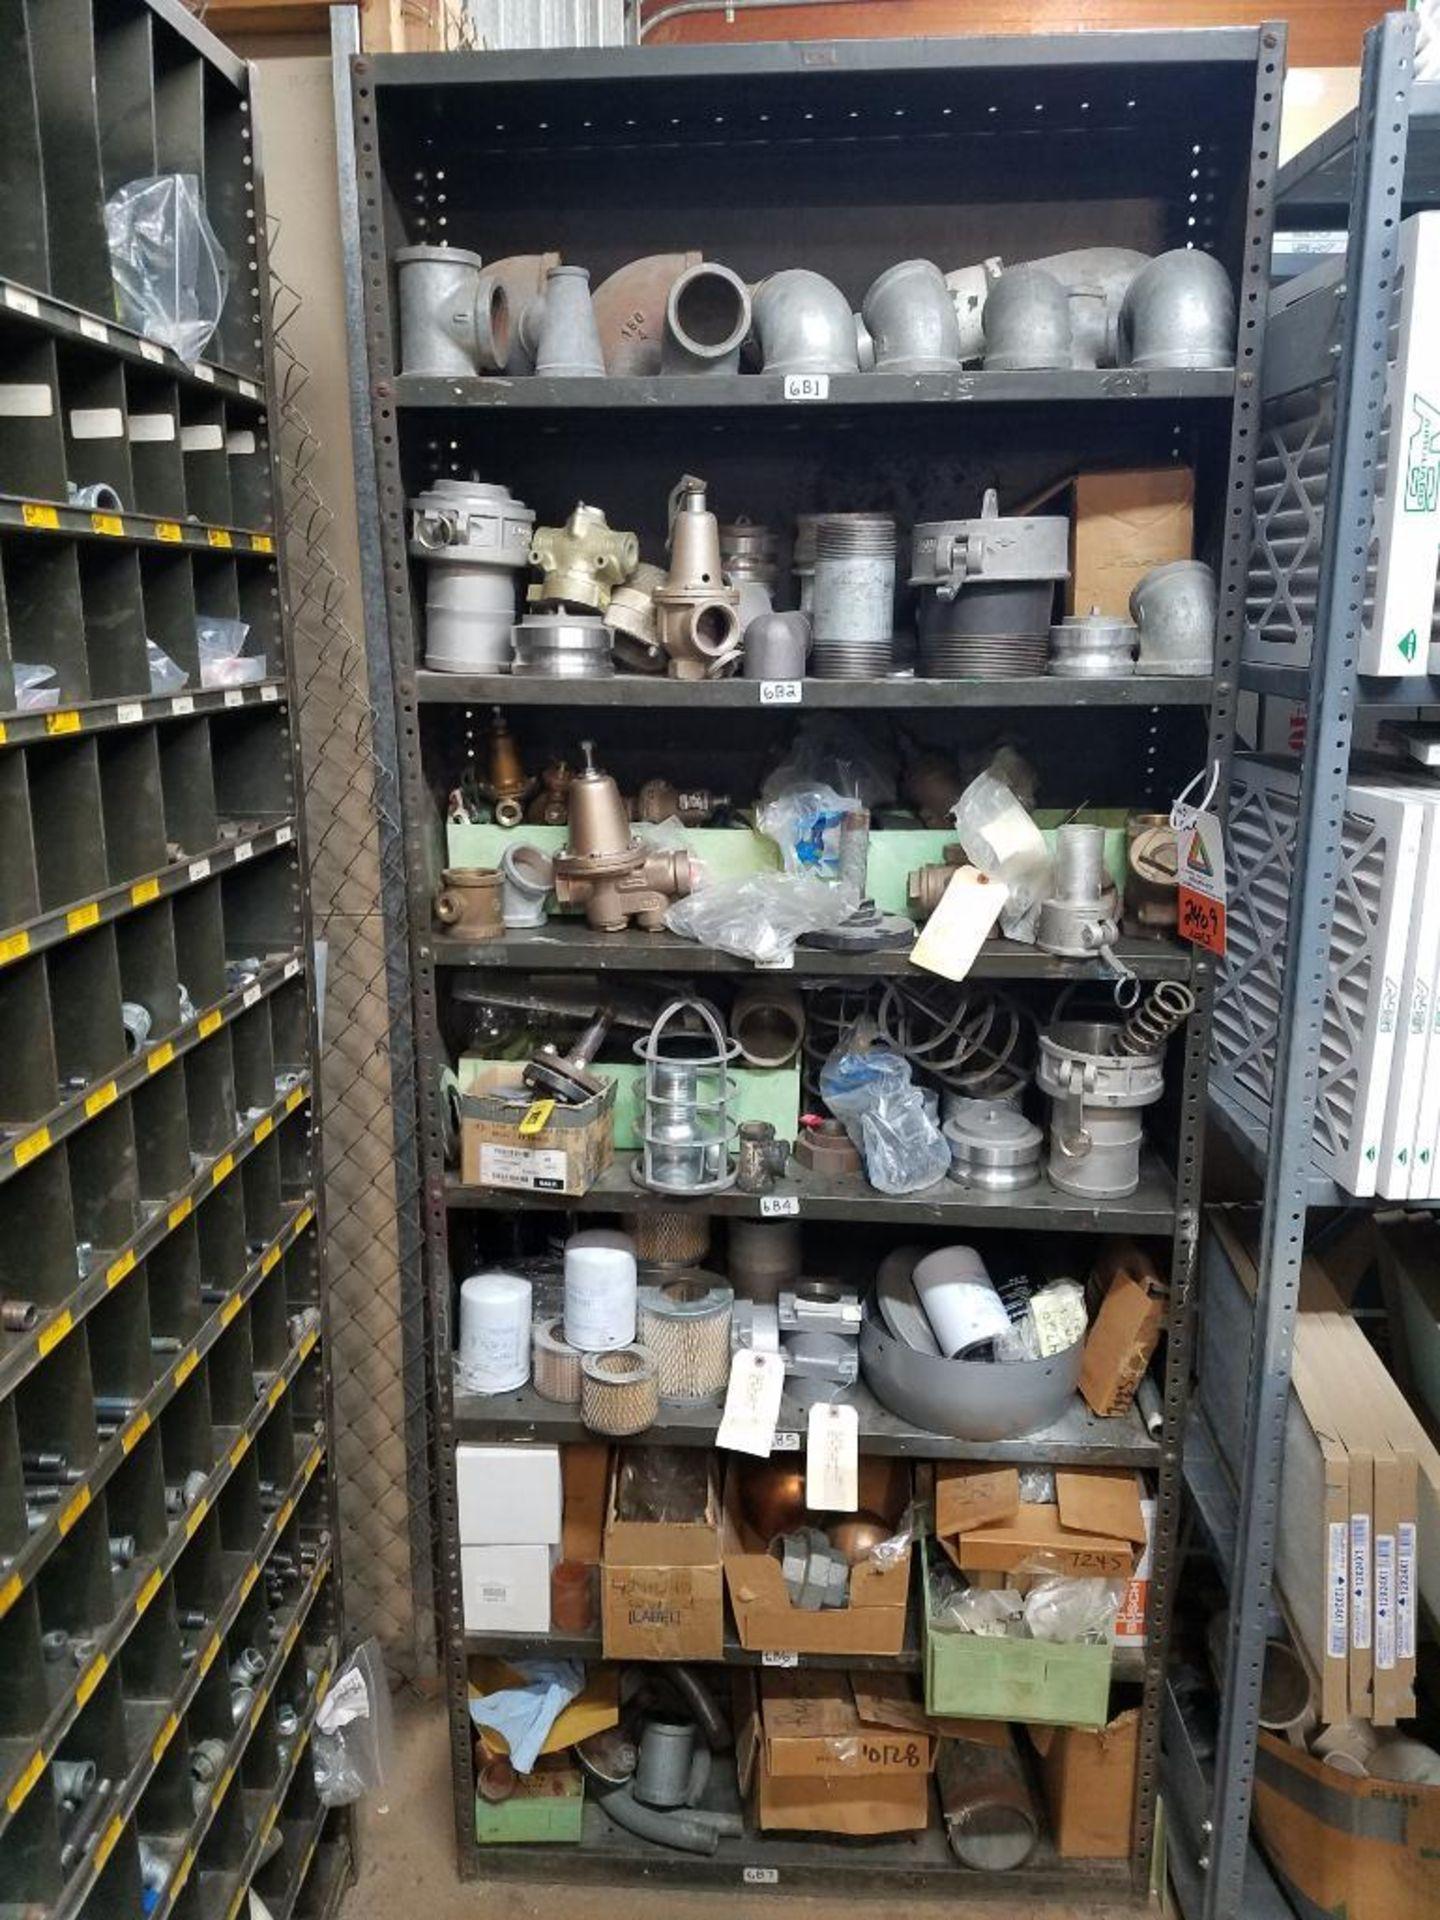 various fittings, threaded pipe, pressure regulators, and oil filters - Image 2 of 2